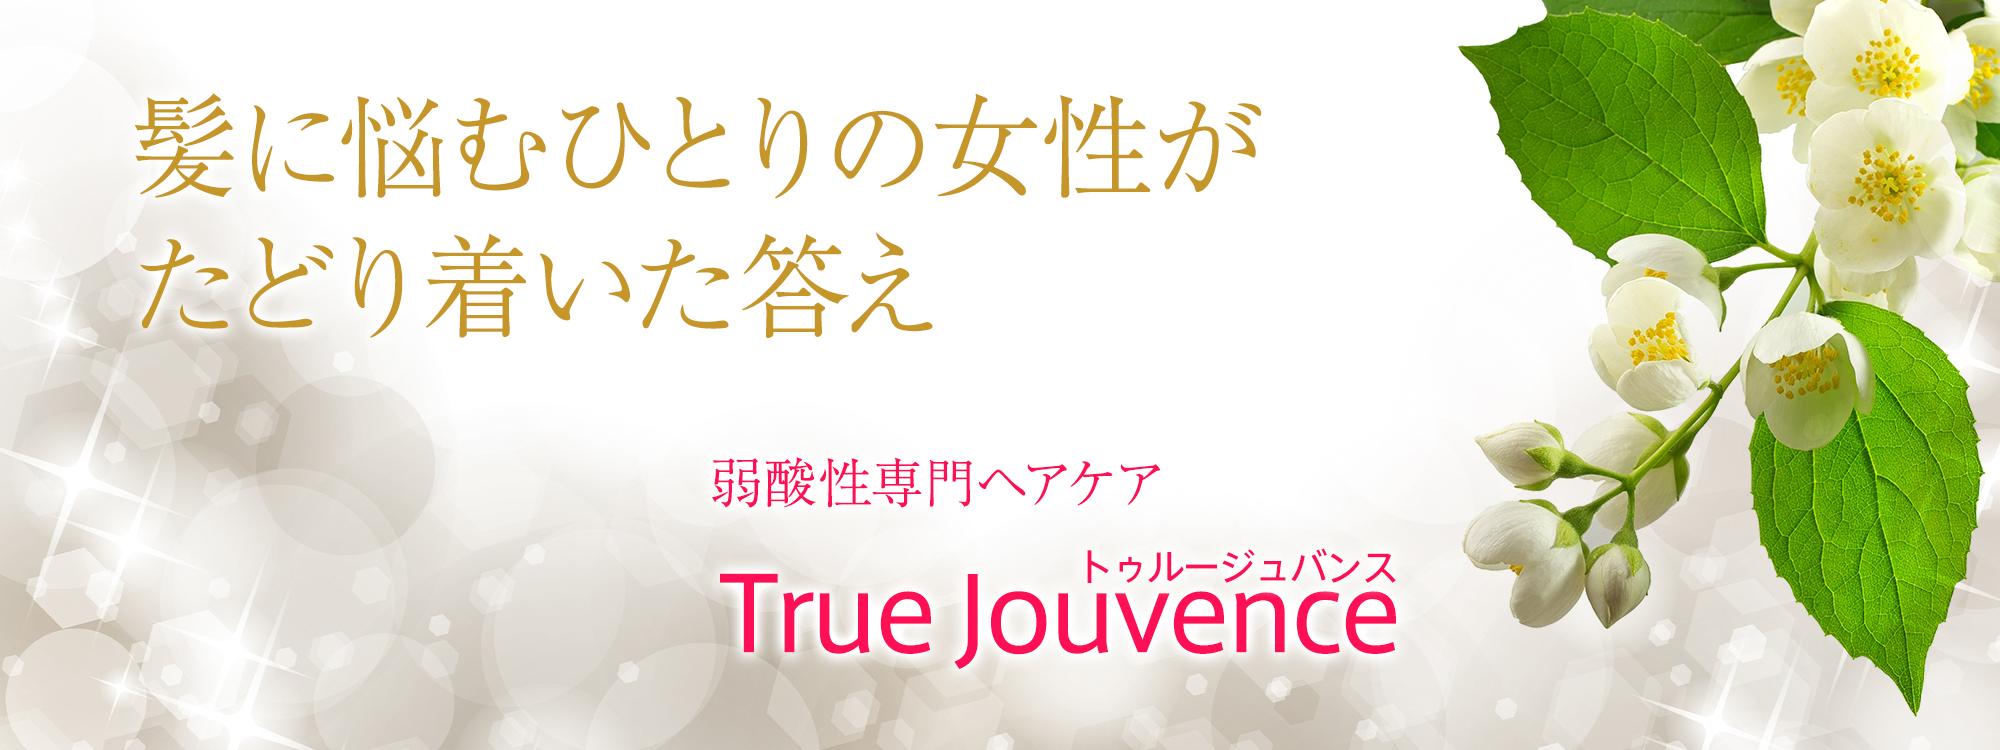 TrueJouvenceバナー03pc